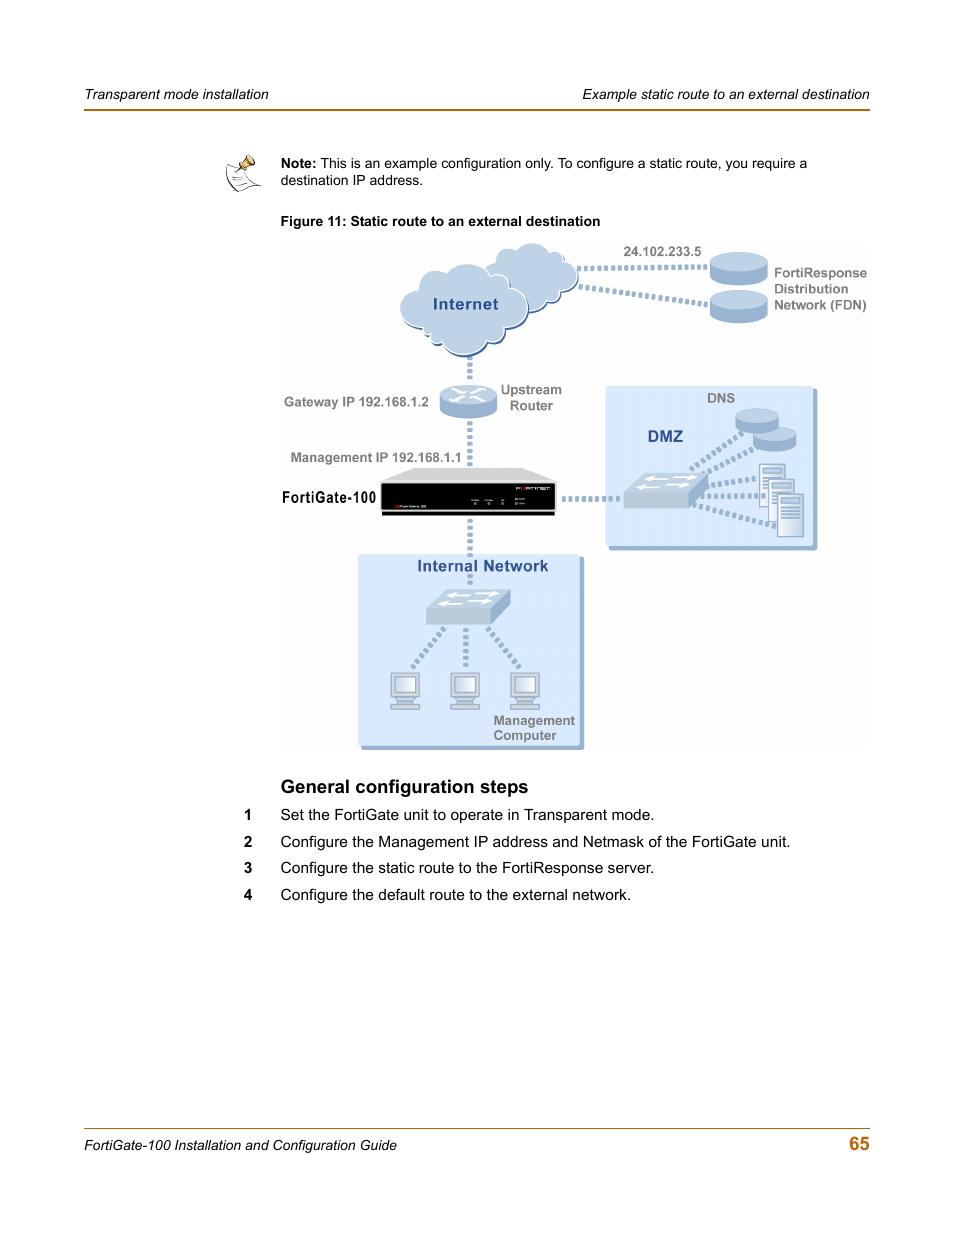 General configuration steps | Fortinet FortiGate 100 User Manual